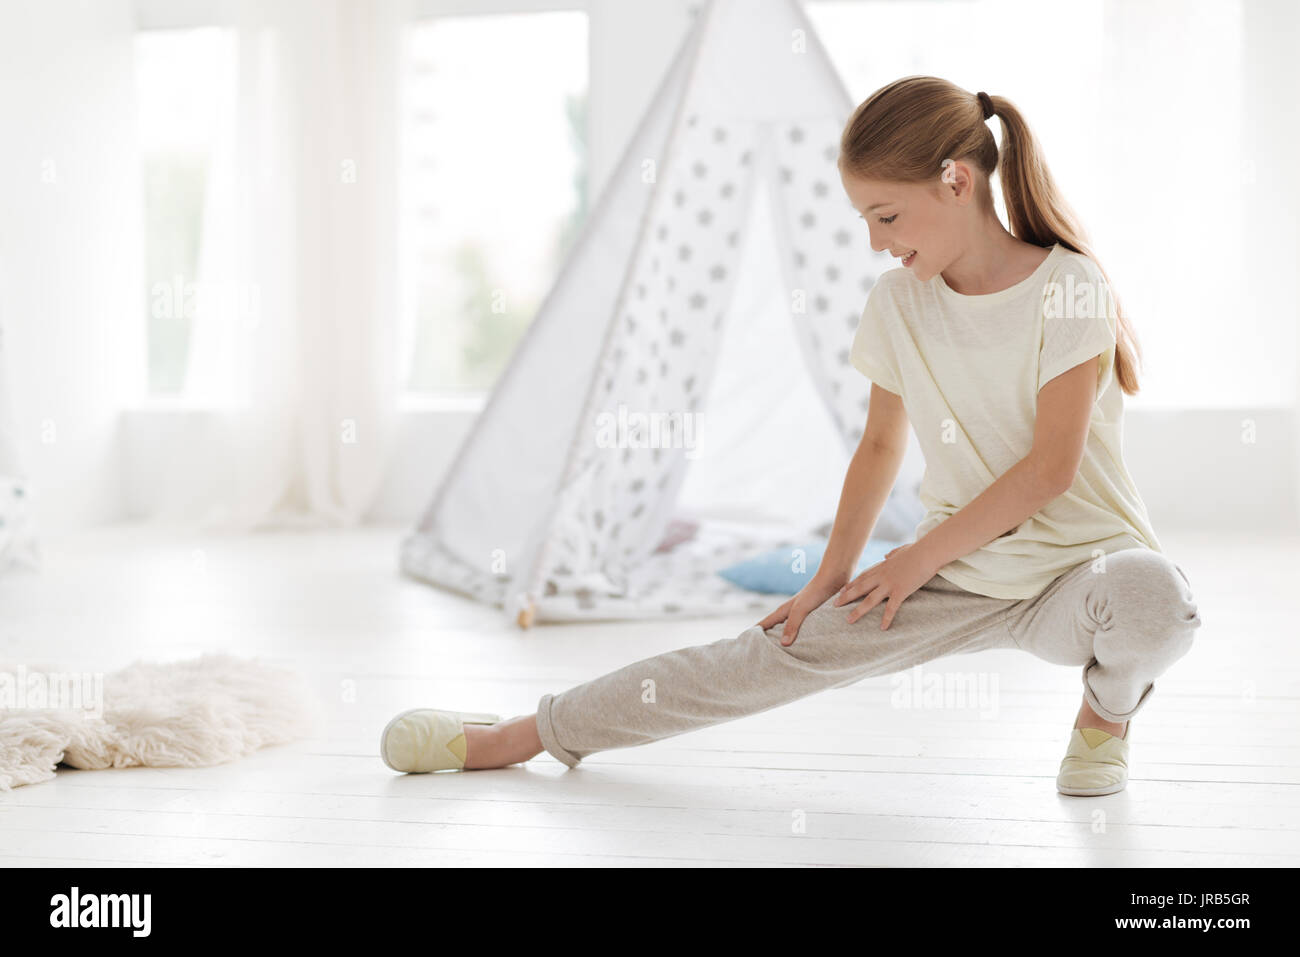 Focused girl doing warm up activities - Stock Image